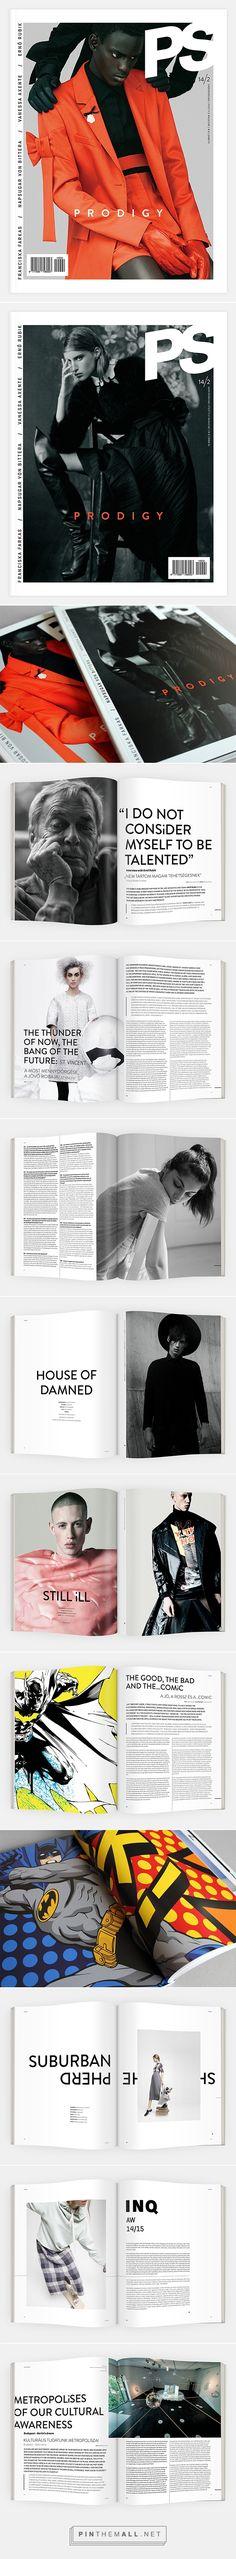 PS magazine - 14/2 by José Simon